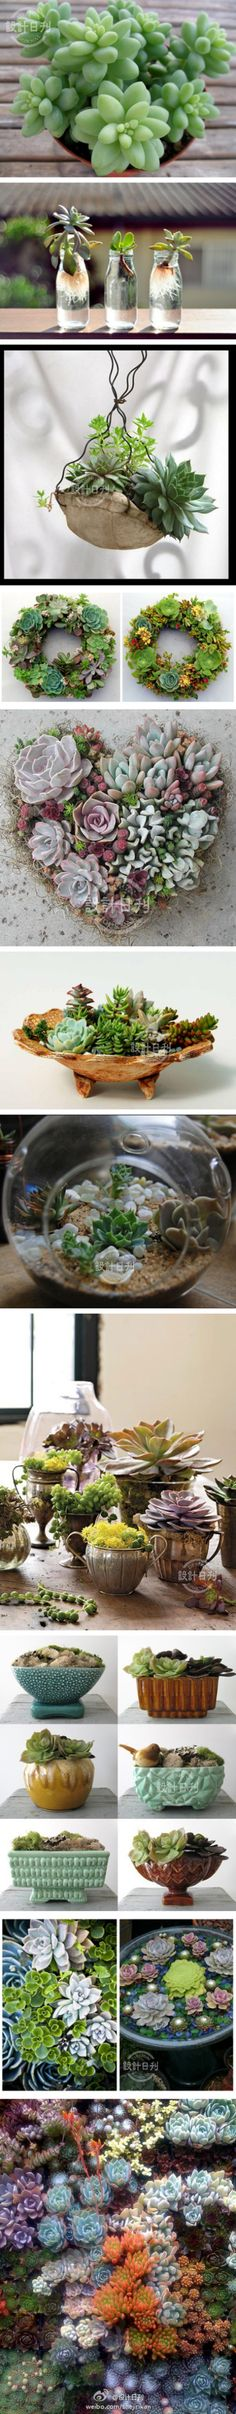 Succulents! by weibo.com/shejirikan  #Succulents